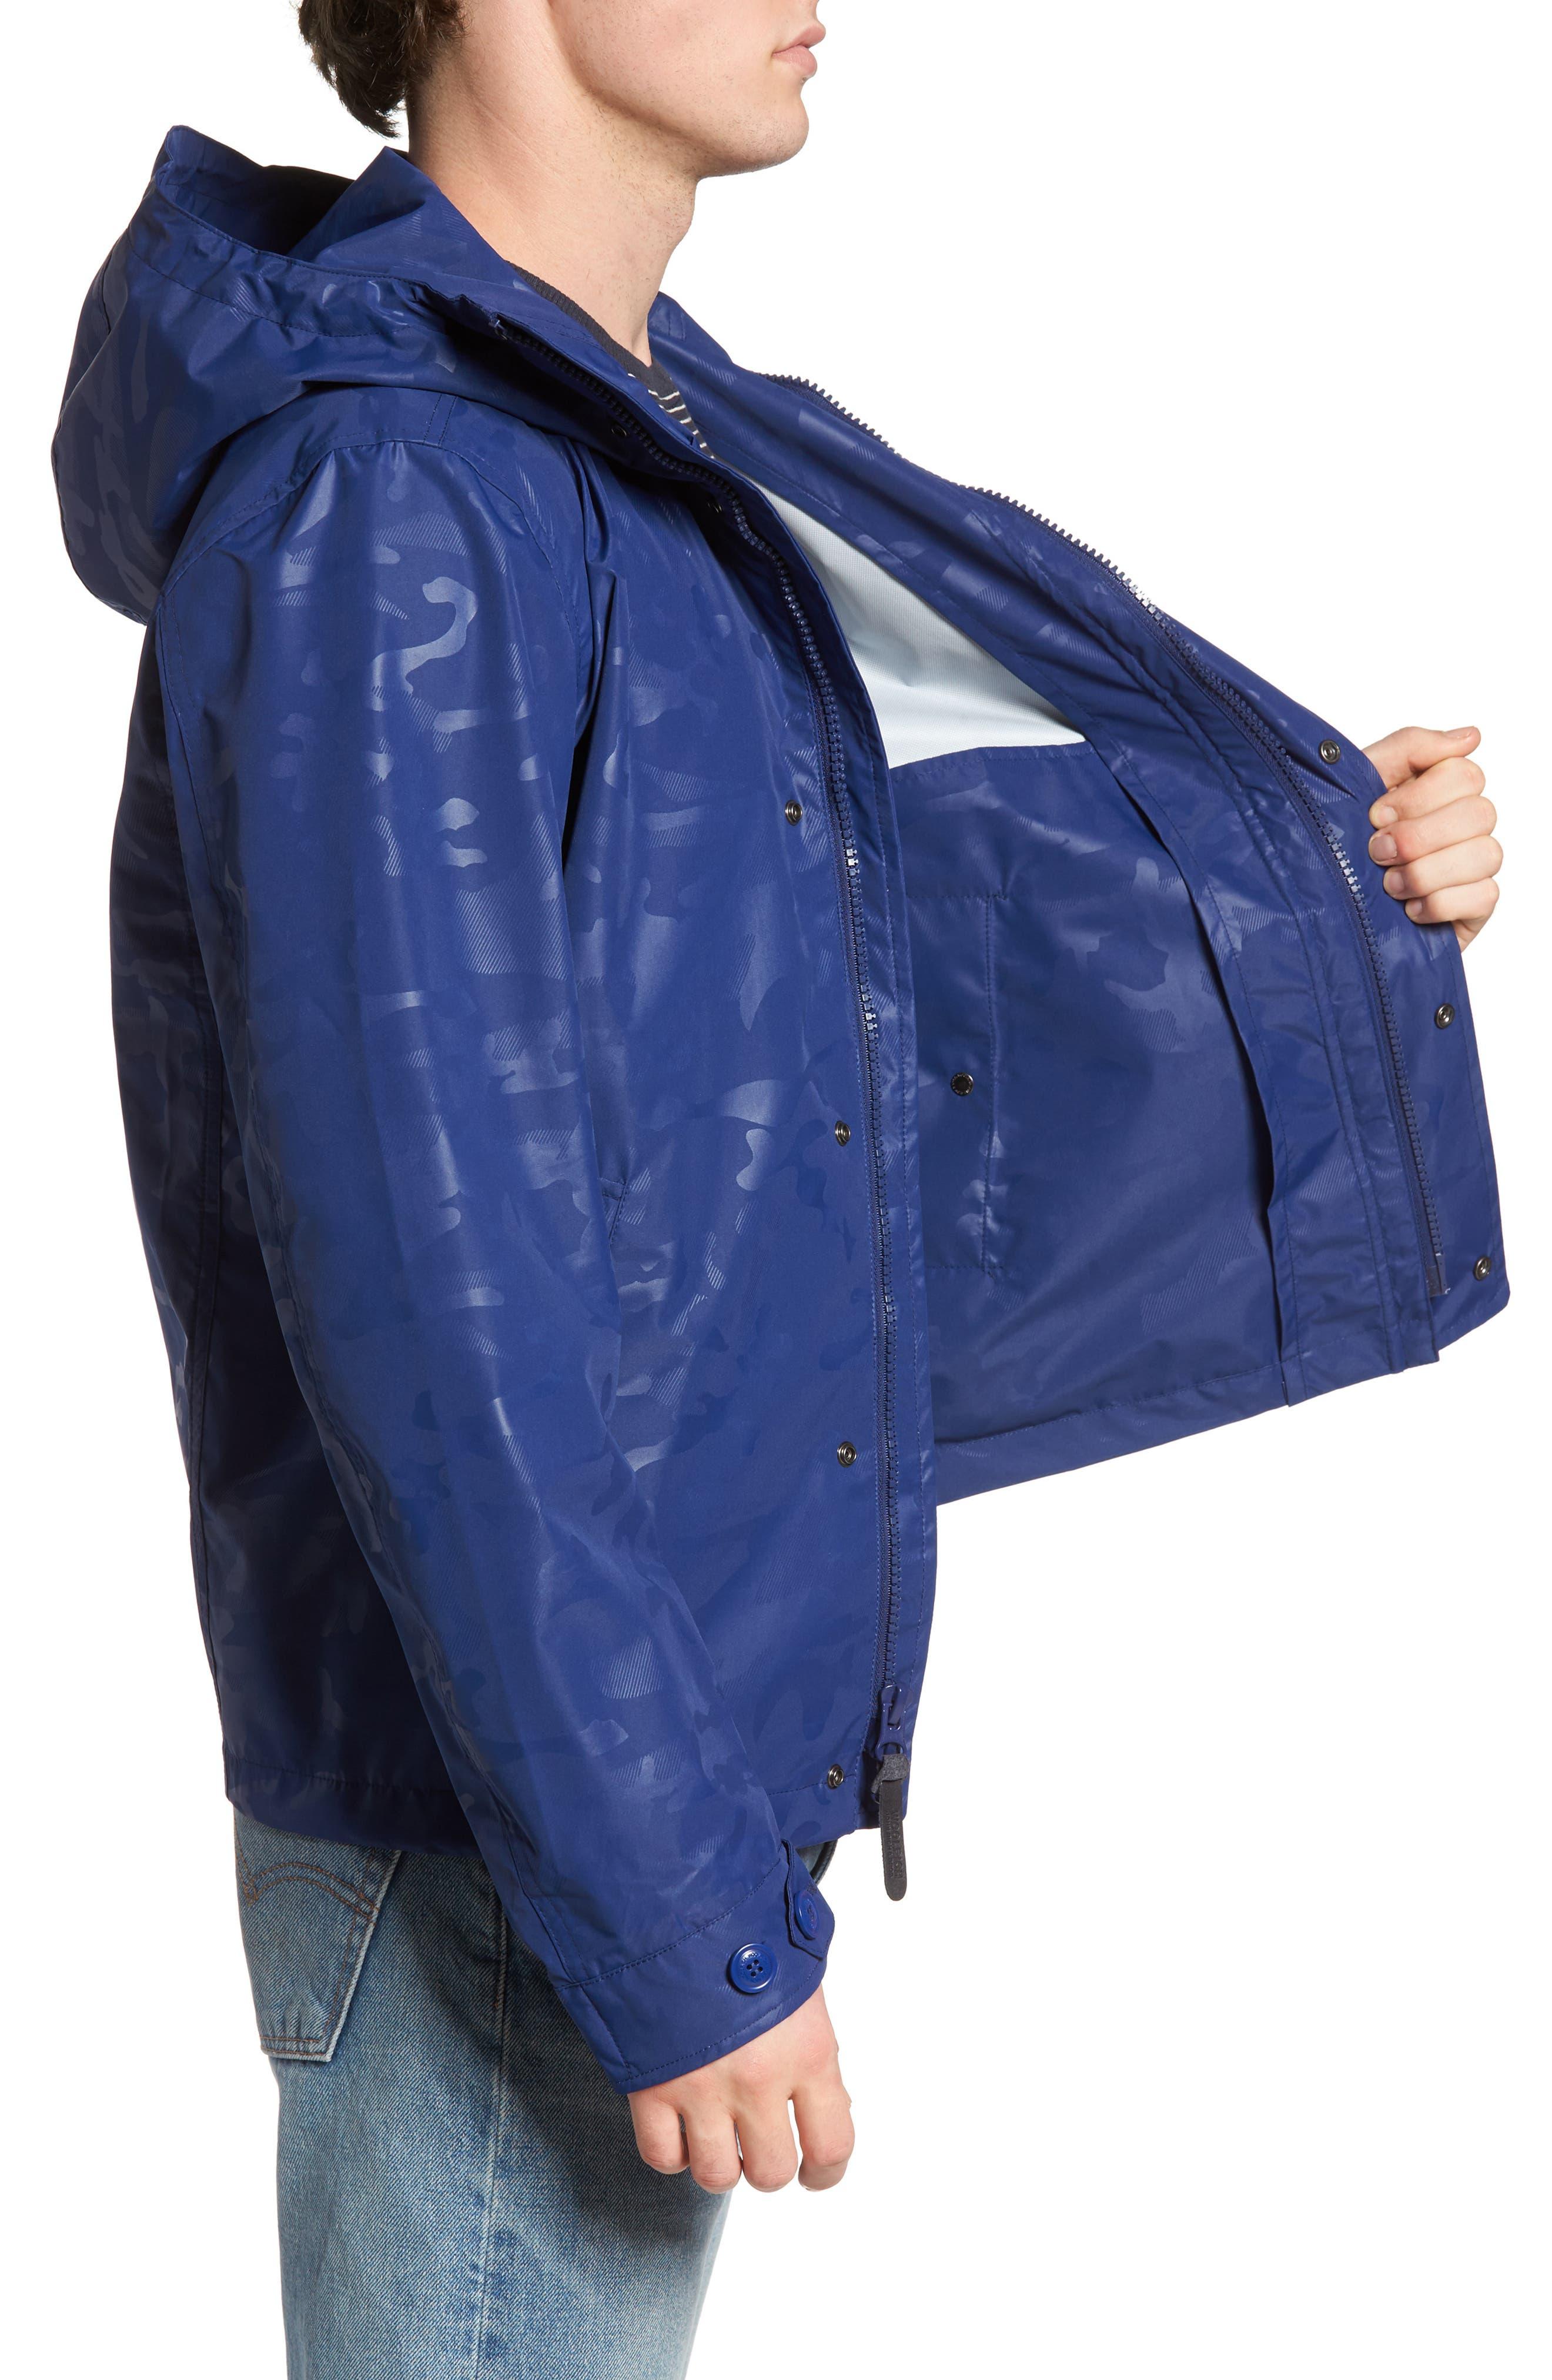 Camou Rudder Waterproof Jacket,                             Alternate thumbnail 3, color,                             Twilight Blue